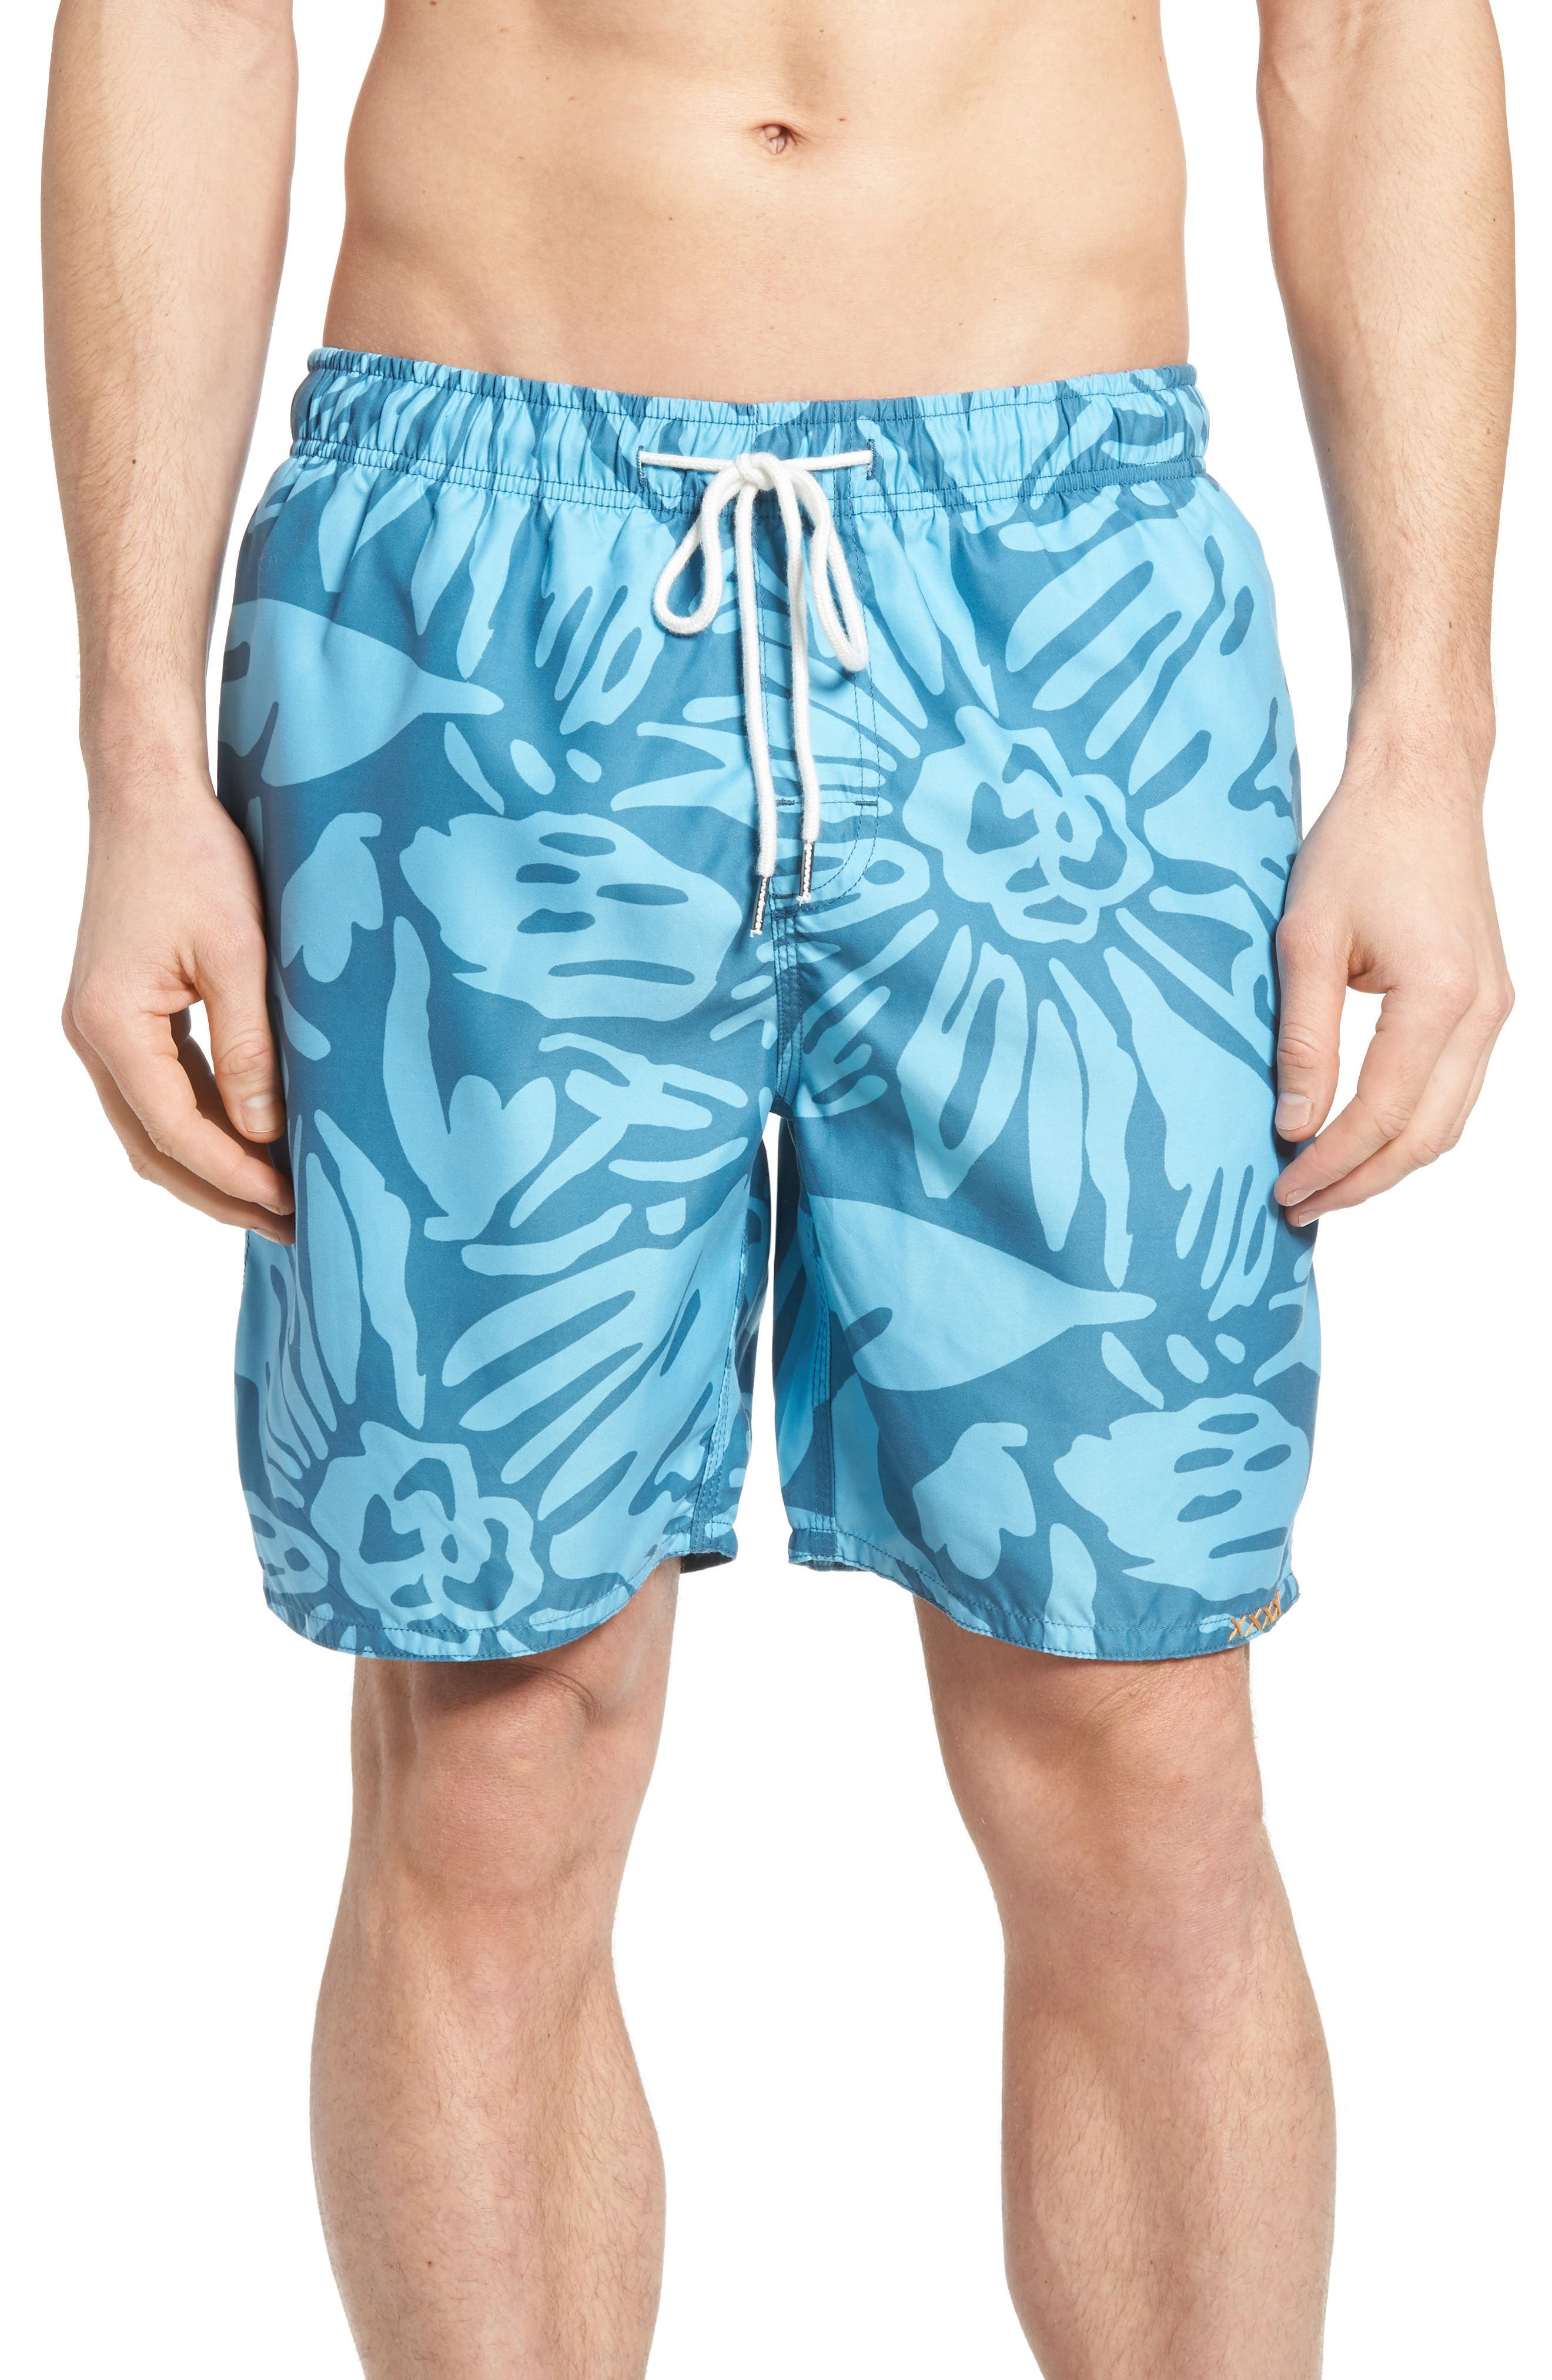 Viceroy Print Swim Trunks,                         Main,                         color,